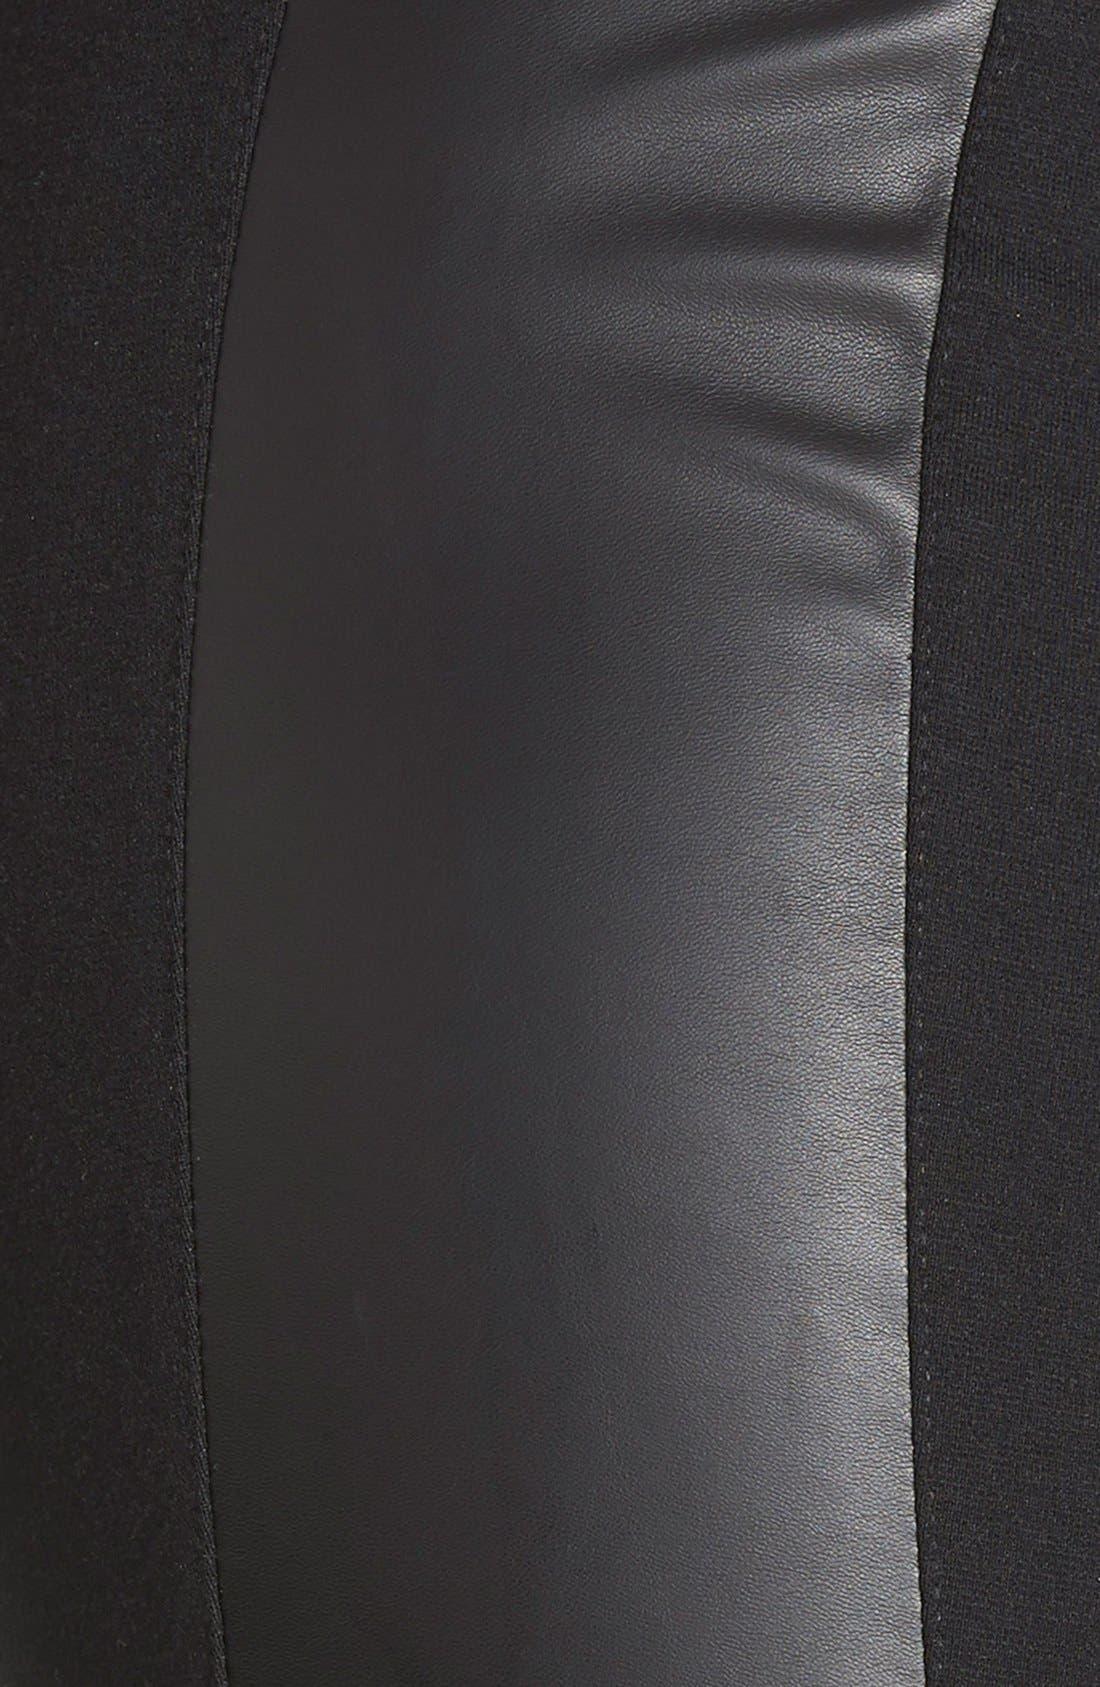 Alternate Image 3  - kensie Faux Leather Trim Ponte Leggings